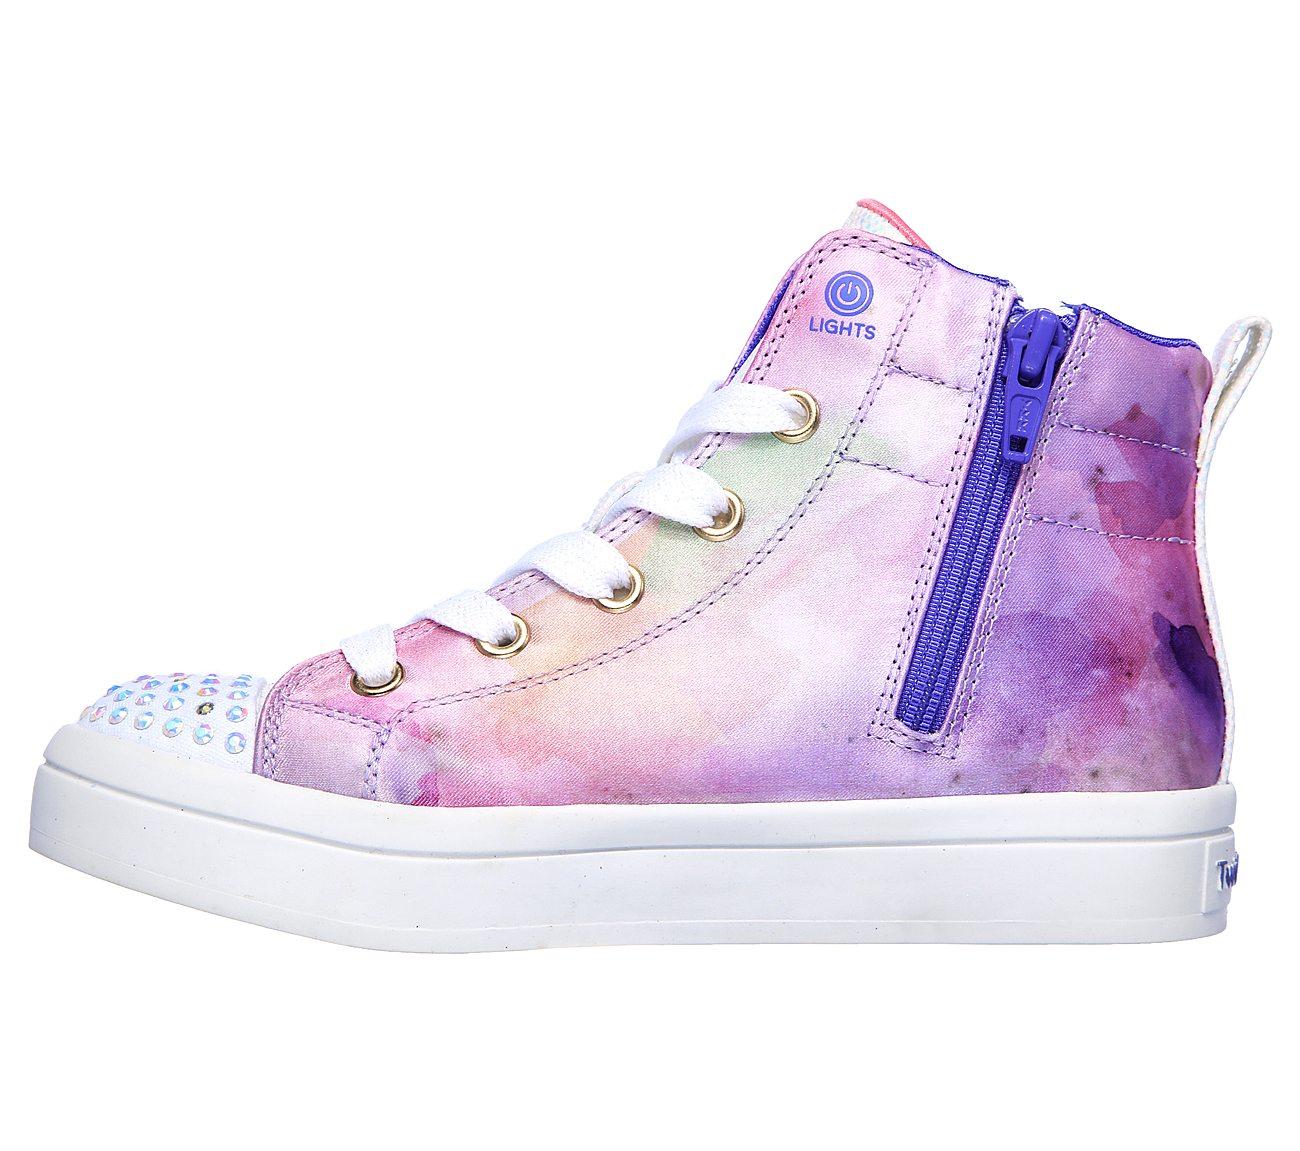 Skechers Girls Twinkle Toes Twi lites Unicorn Splash Purple rnp6y